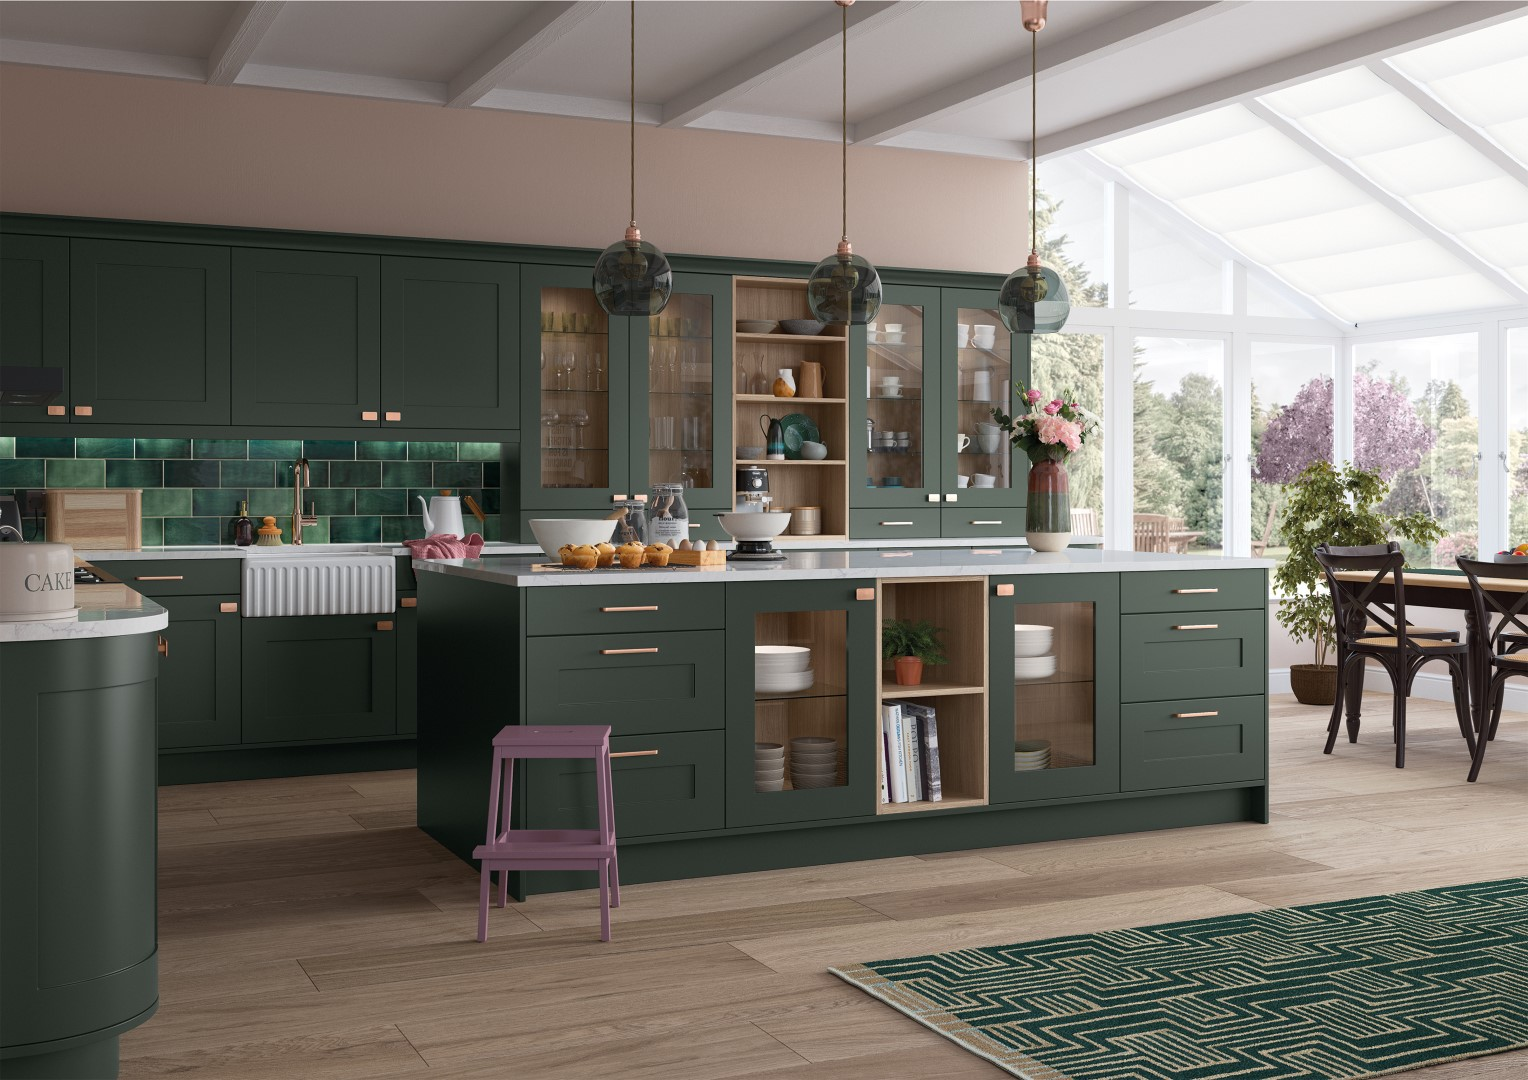 Georgia Deep Forest - Kitchen Design - Alan Kelly Kitchens - Waterford - 5